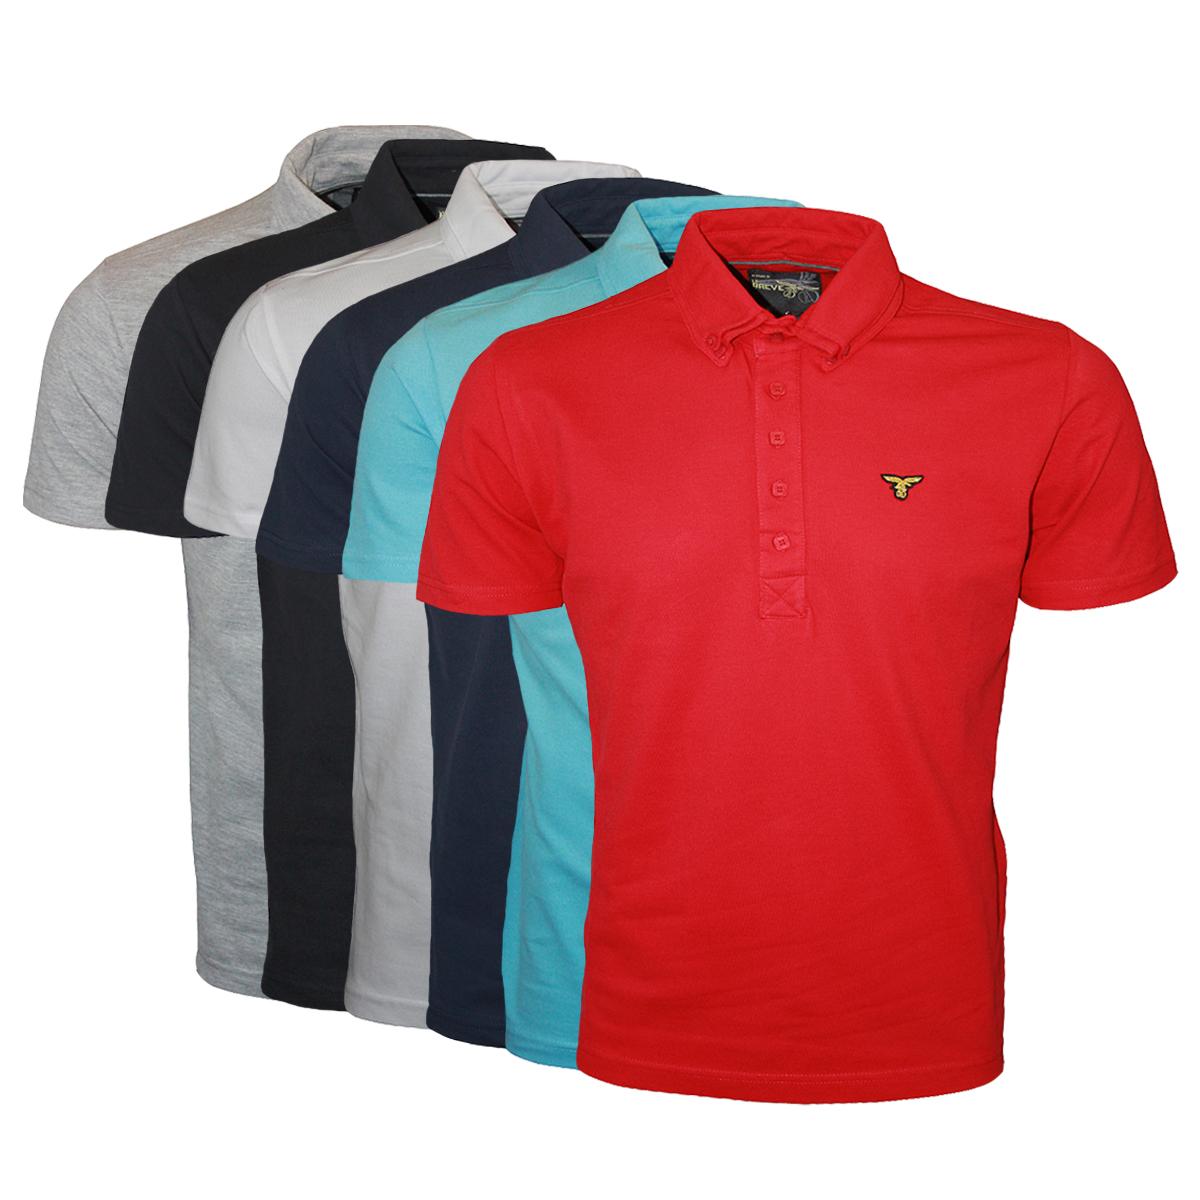 Design t shirt collar - Le Breve Jeans Mens Designer Bill Collar Polo Neck T Shirt Top Sizes S Xxl